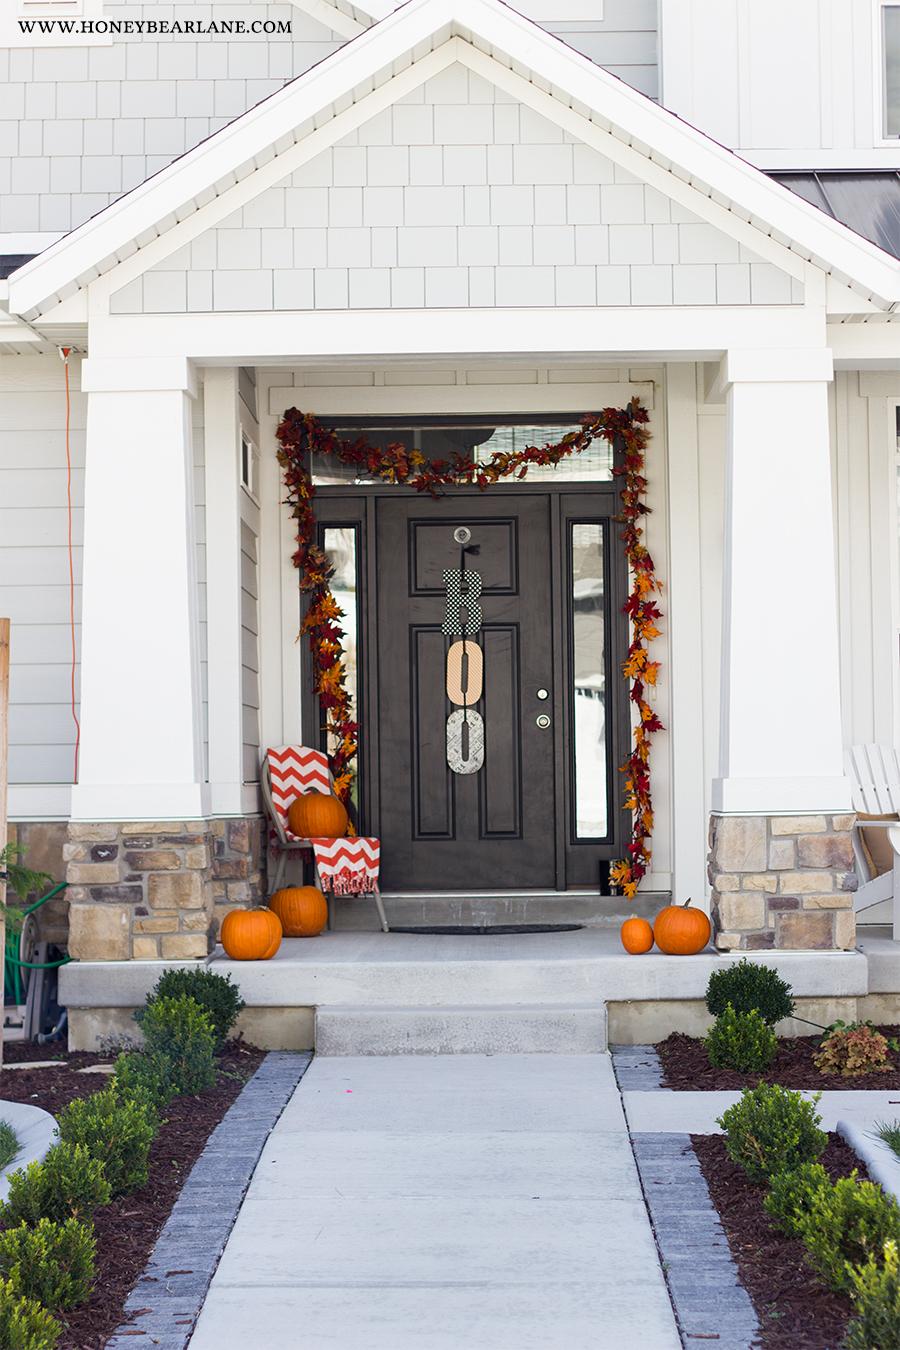 Farmhouse Halloween Front Porch Decor - Honeybear Lane